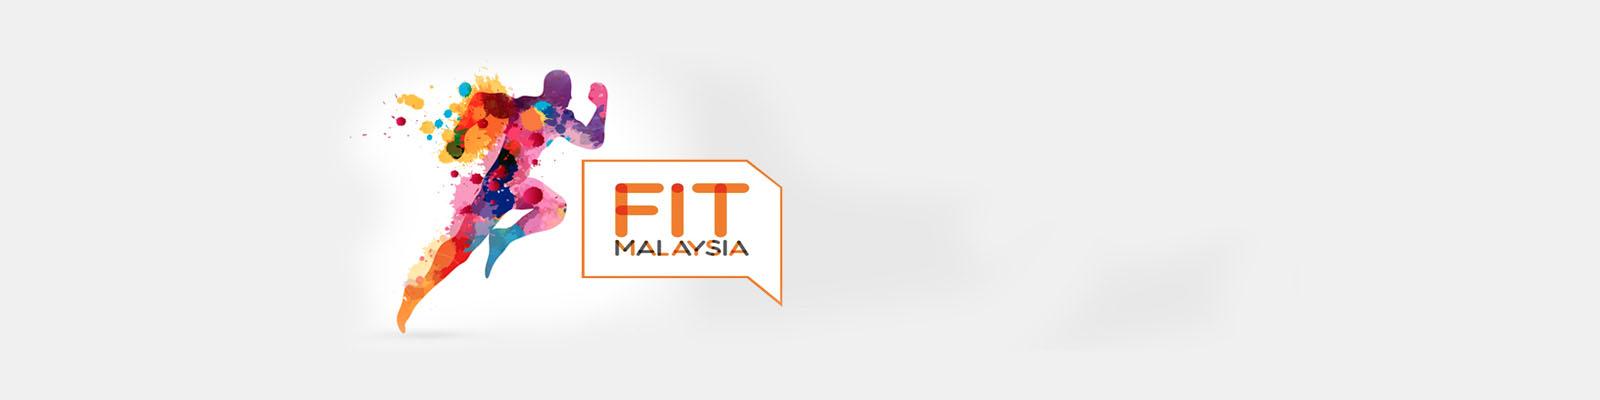 fit-malaysia.jpg